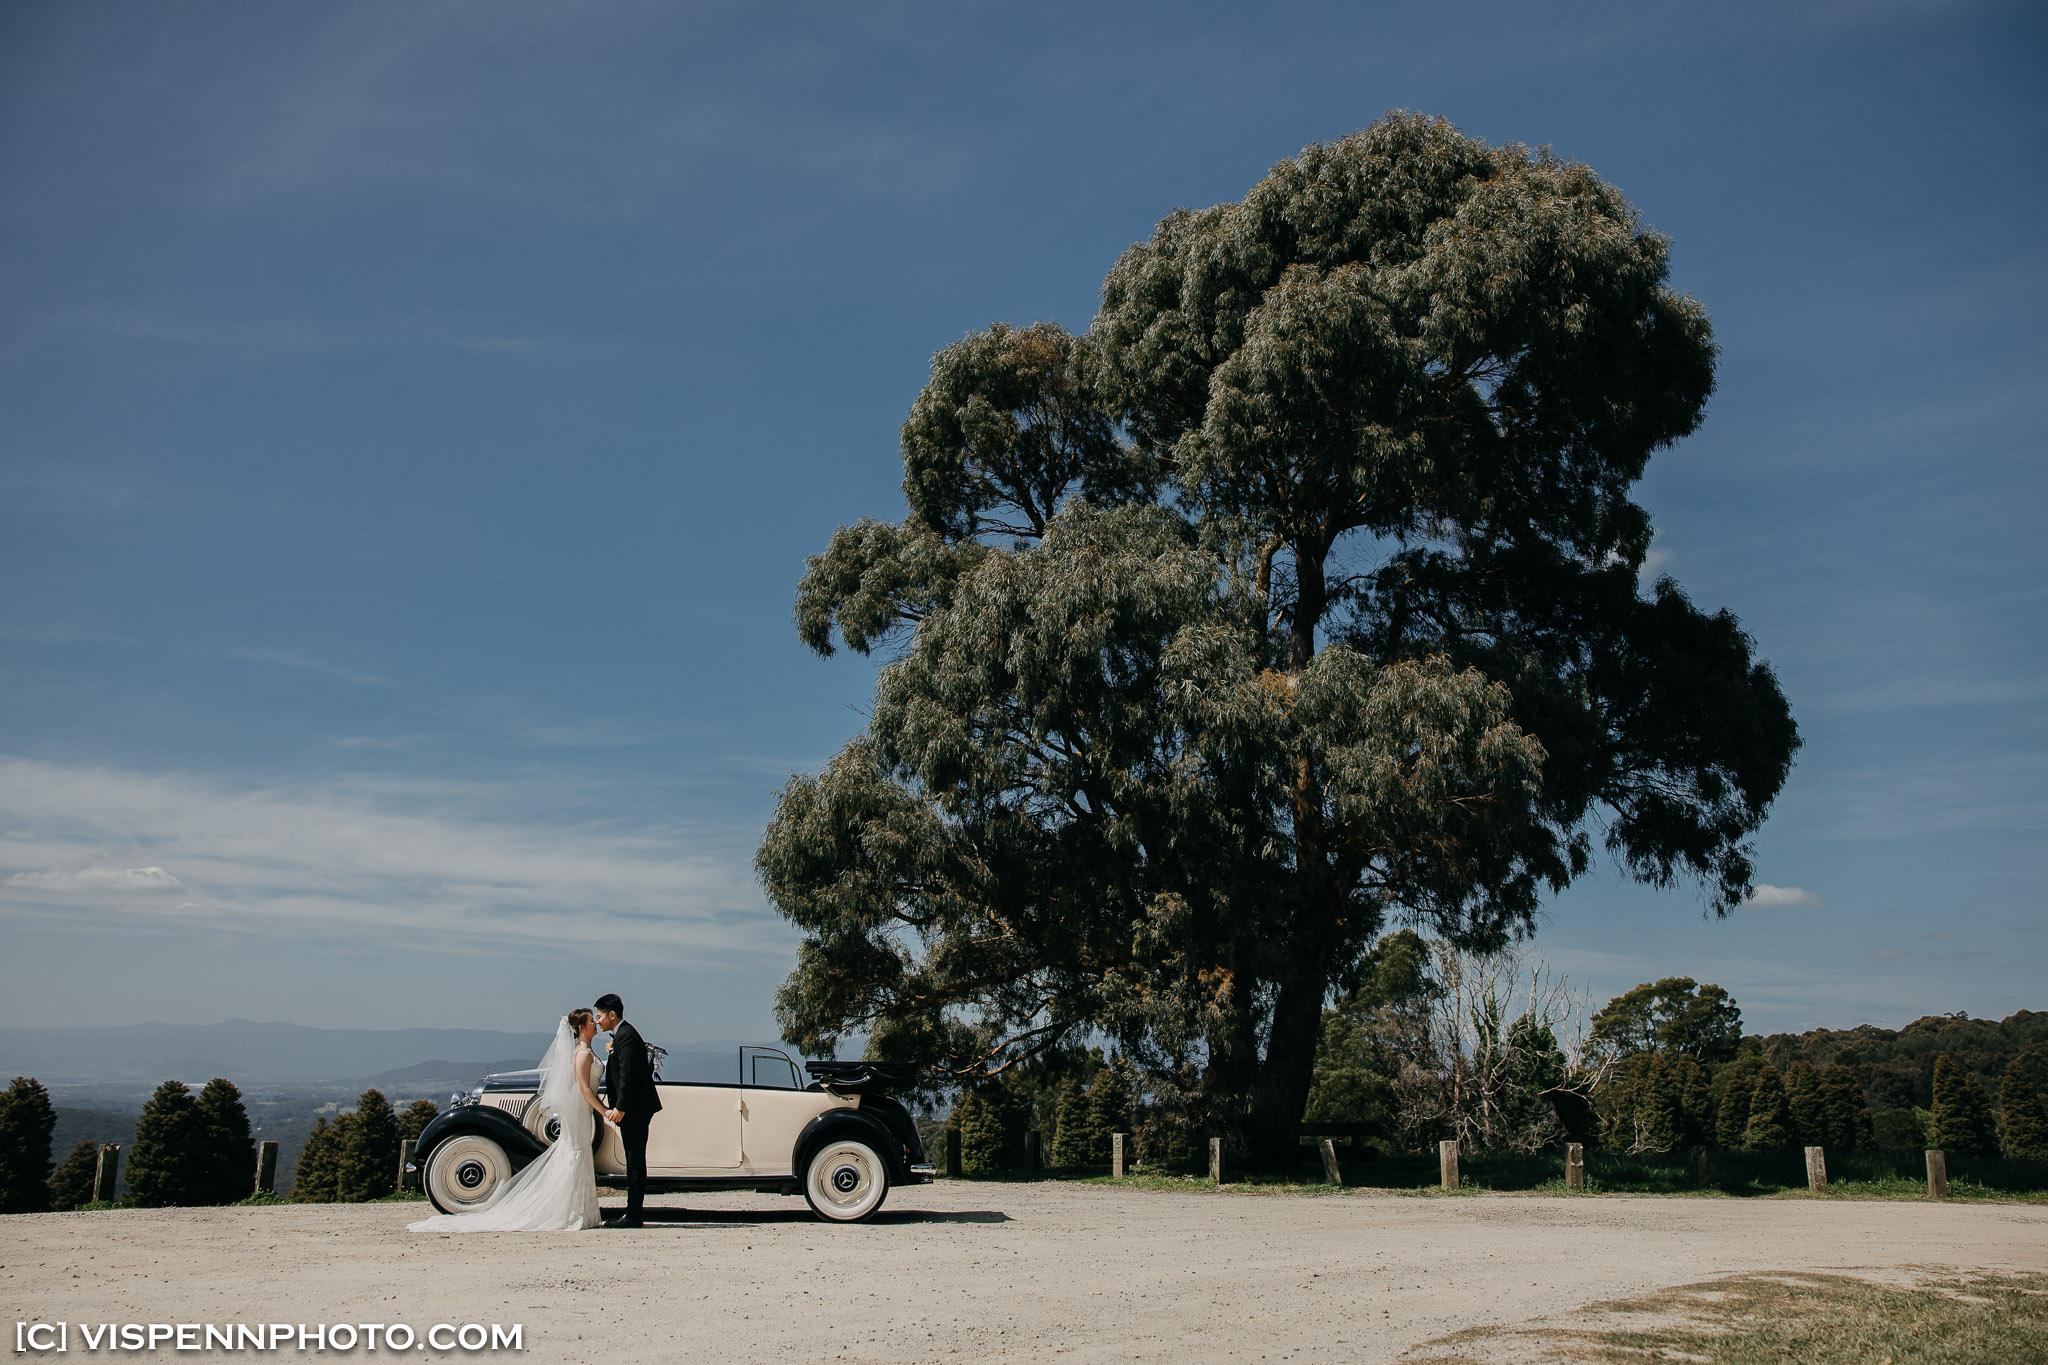 WEDDING DAY Photography Melbourne VISPENN 墨尔本 婚礼跟拍 婚礼摄像 婚礼摄影 结婚照 登记照 ElitaPB 06280 1P EOSR VISPENN